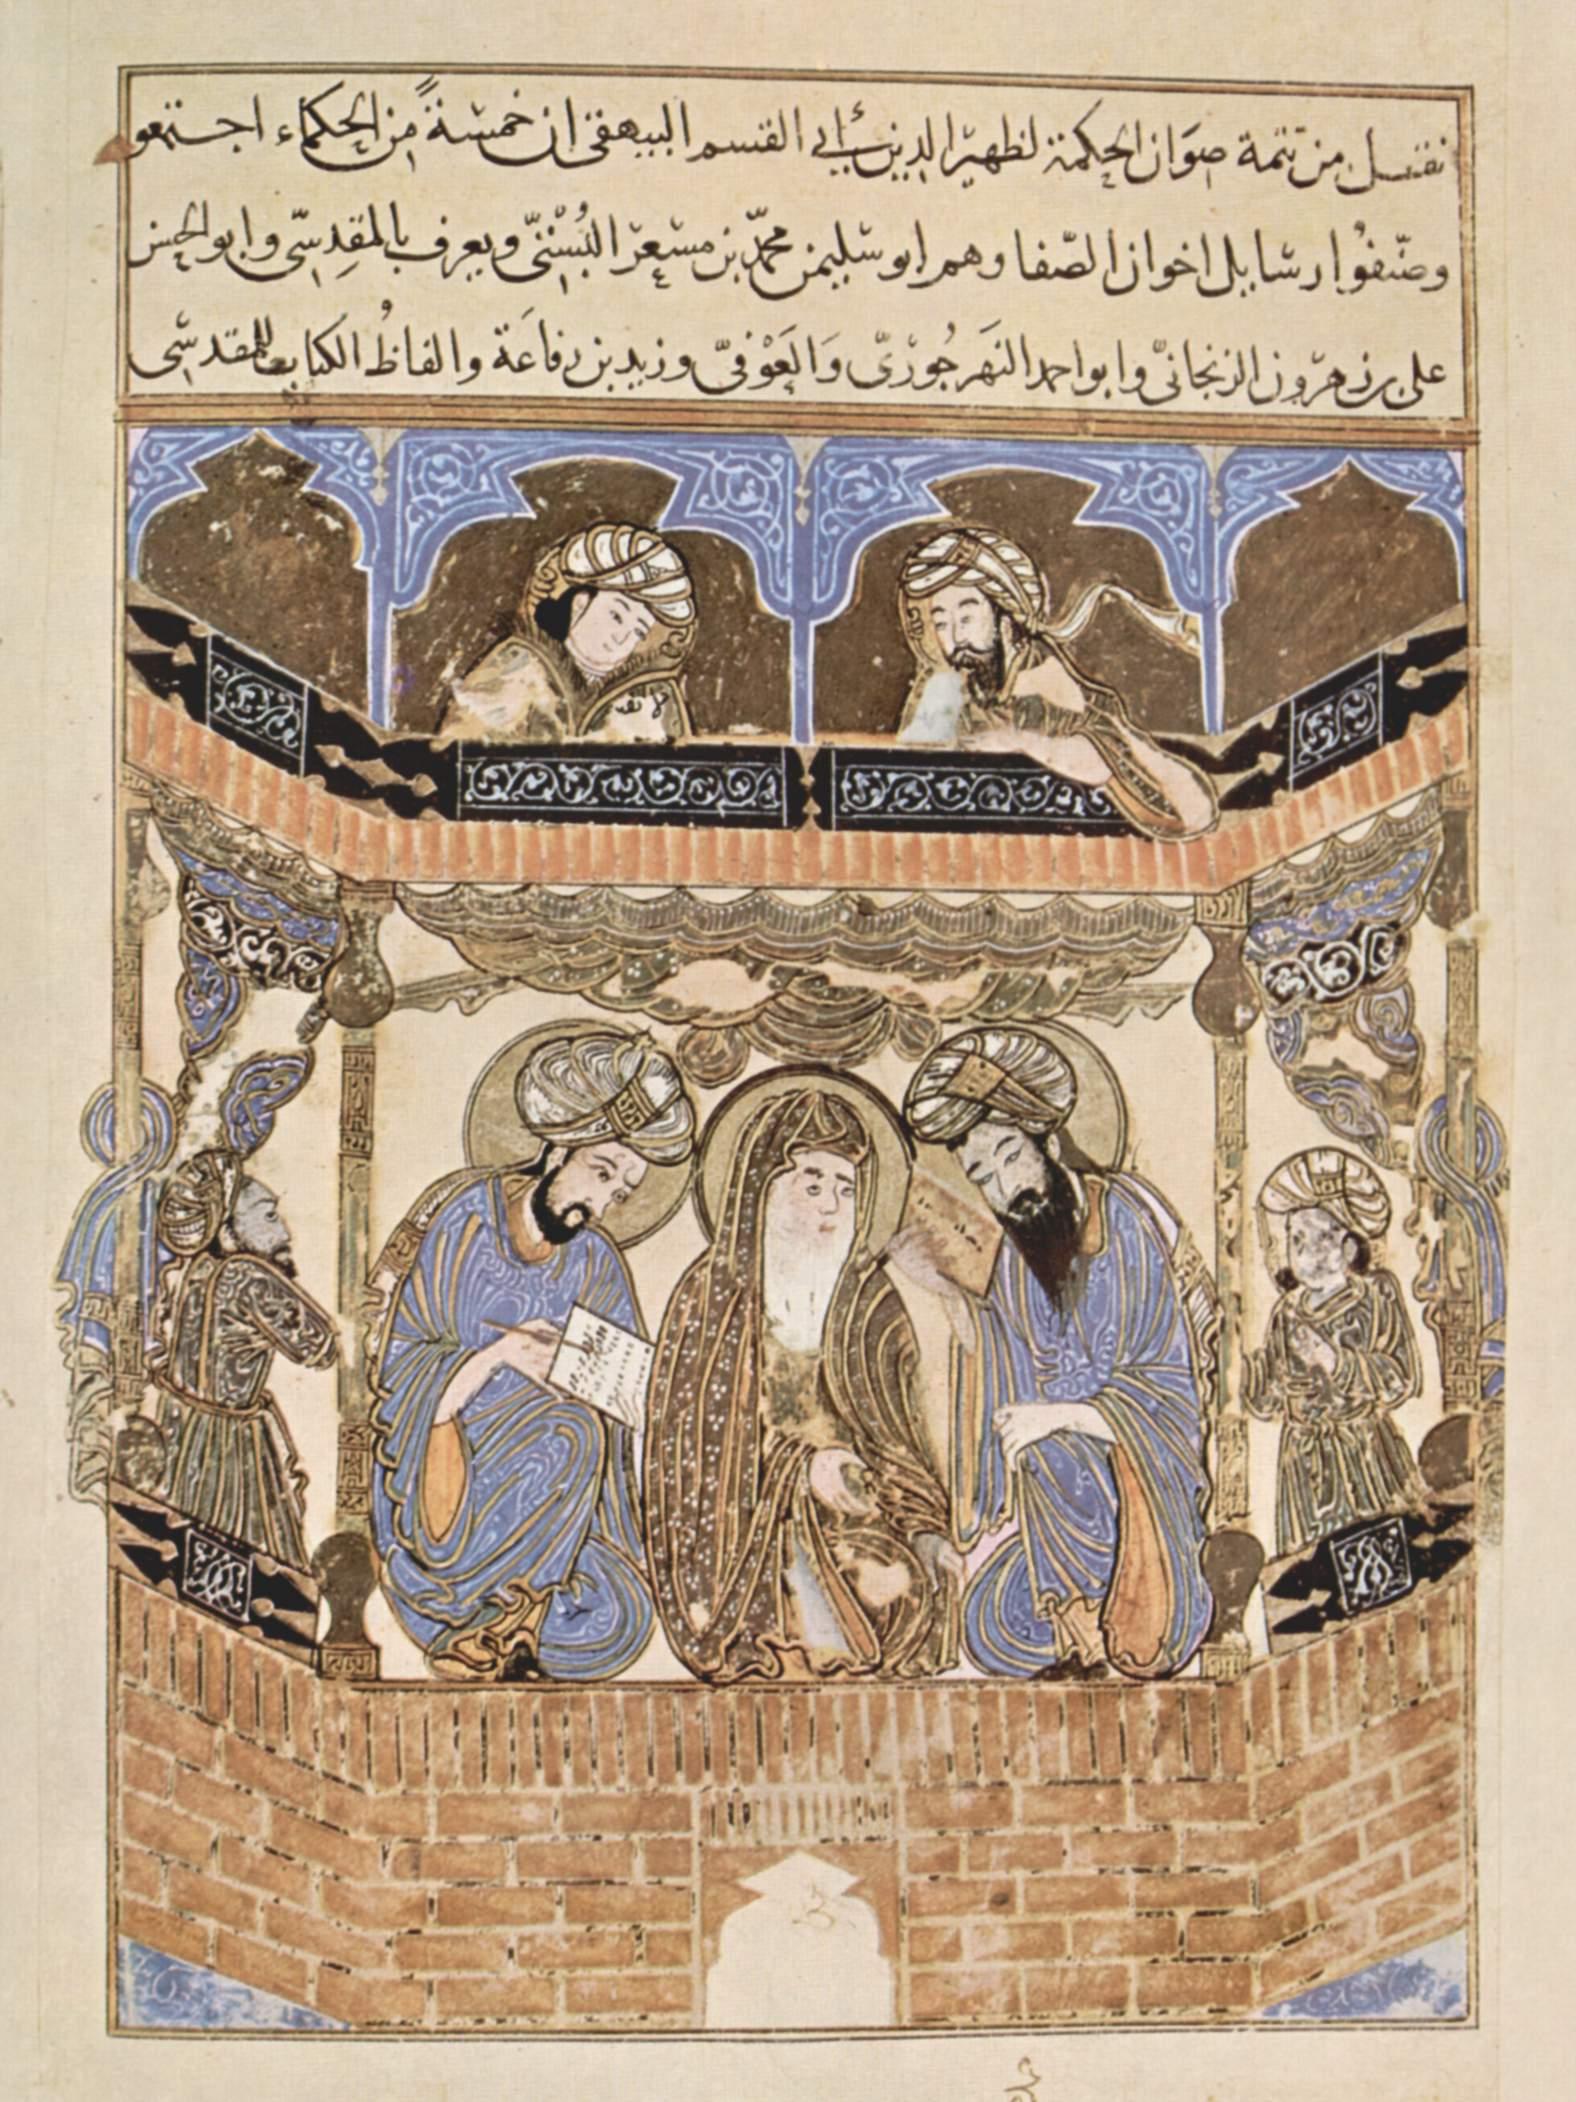 Ikhwane al Safa_Irakischer_Maler_von_1287_001